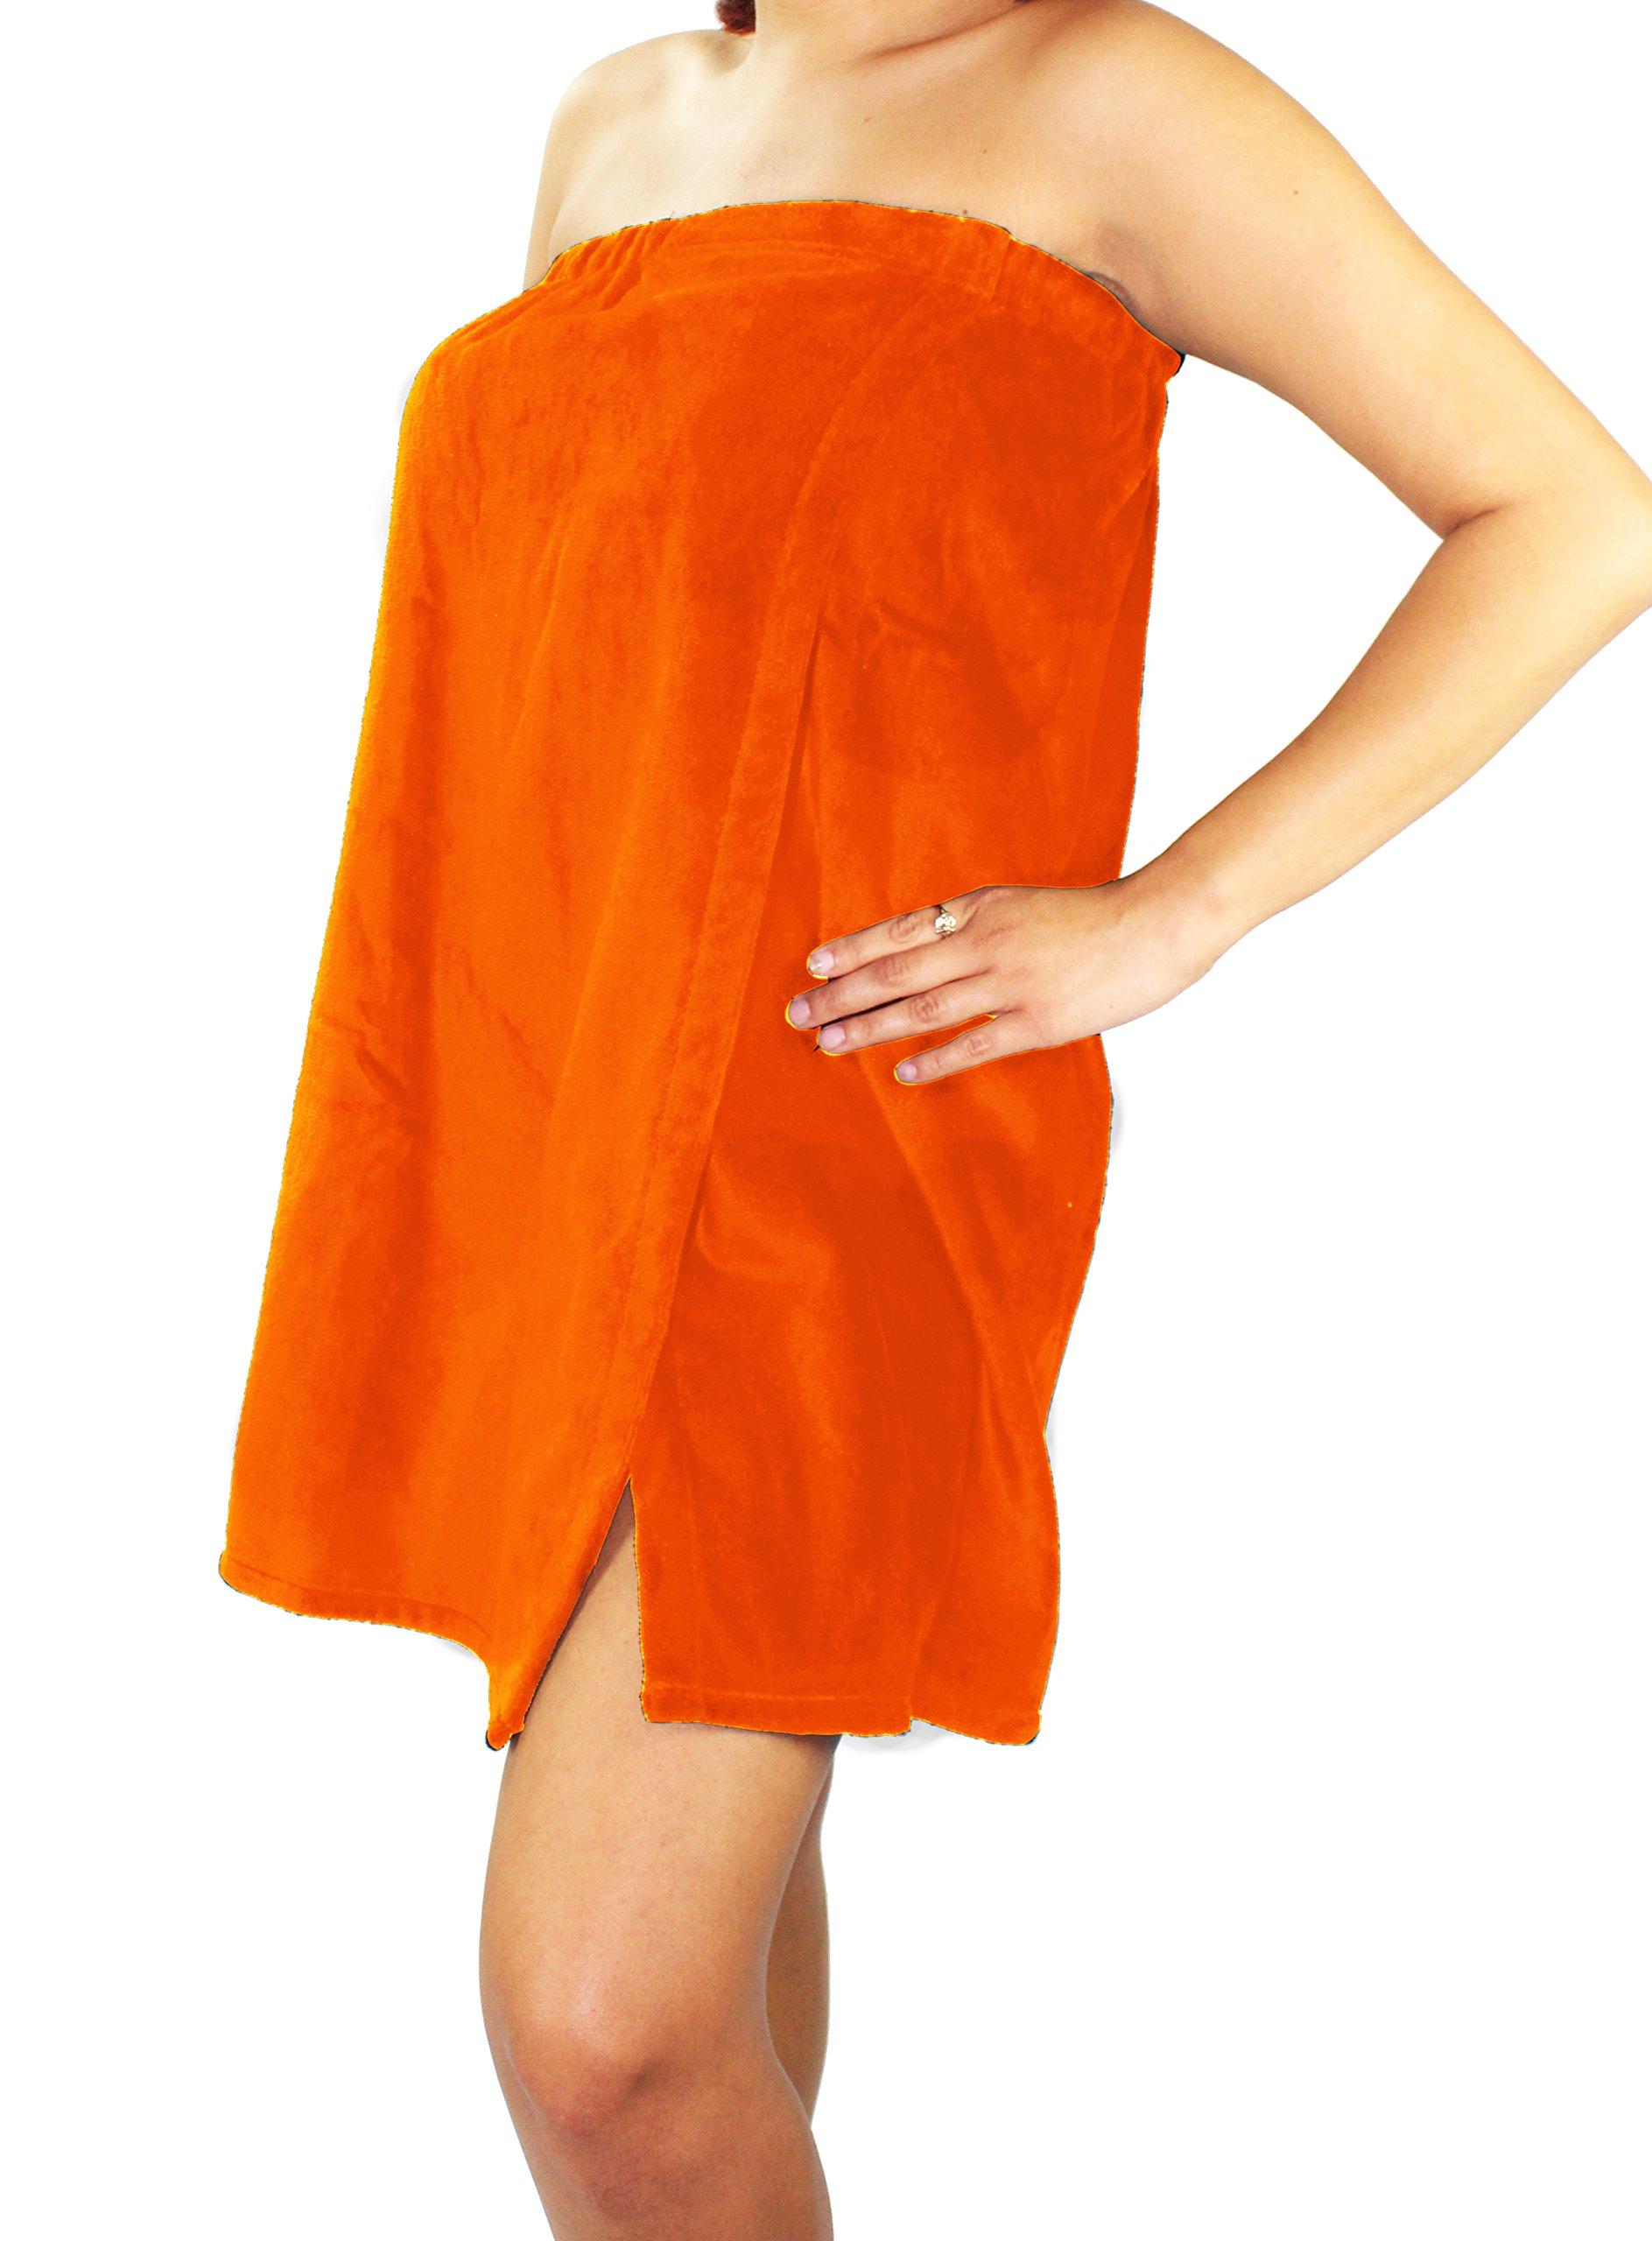 Sanders Classics 25'' Terry Towel Wrap - Orange